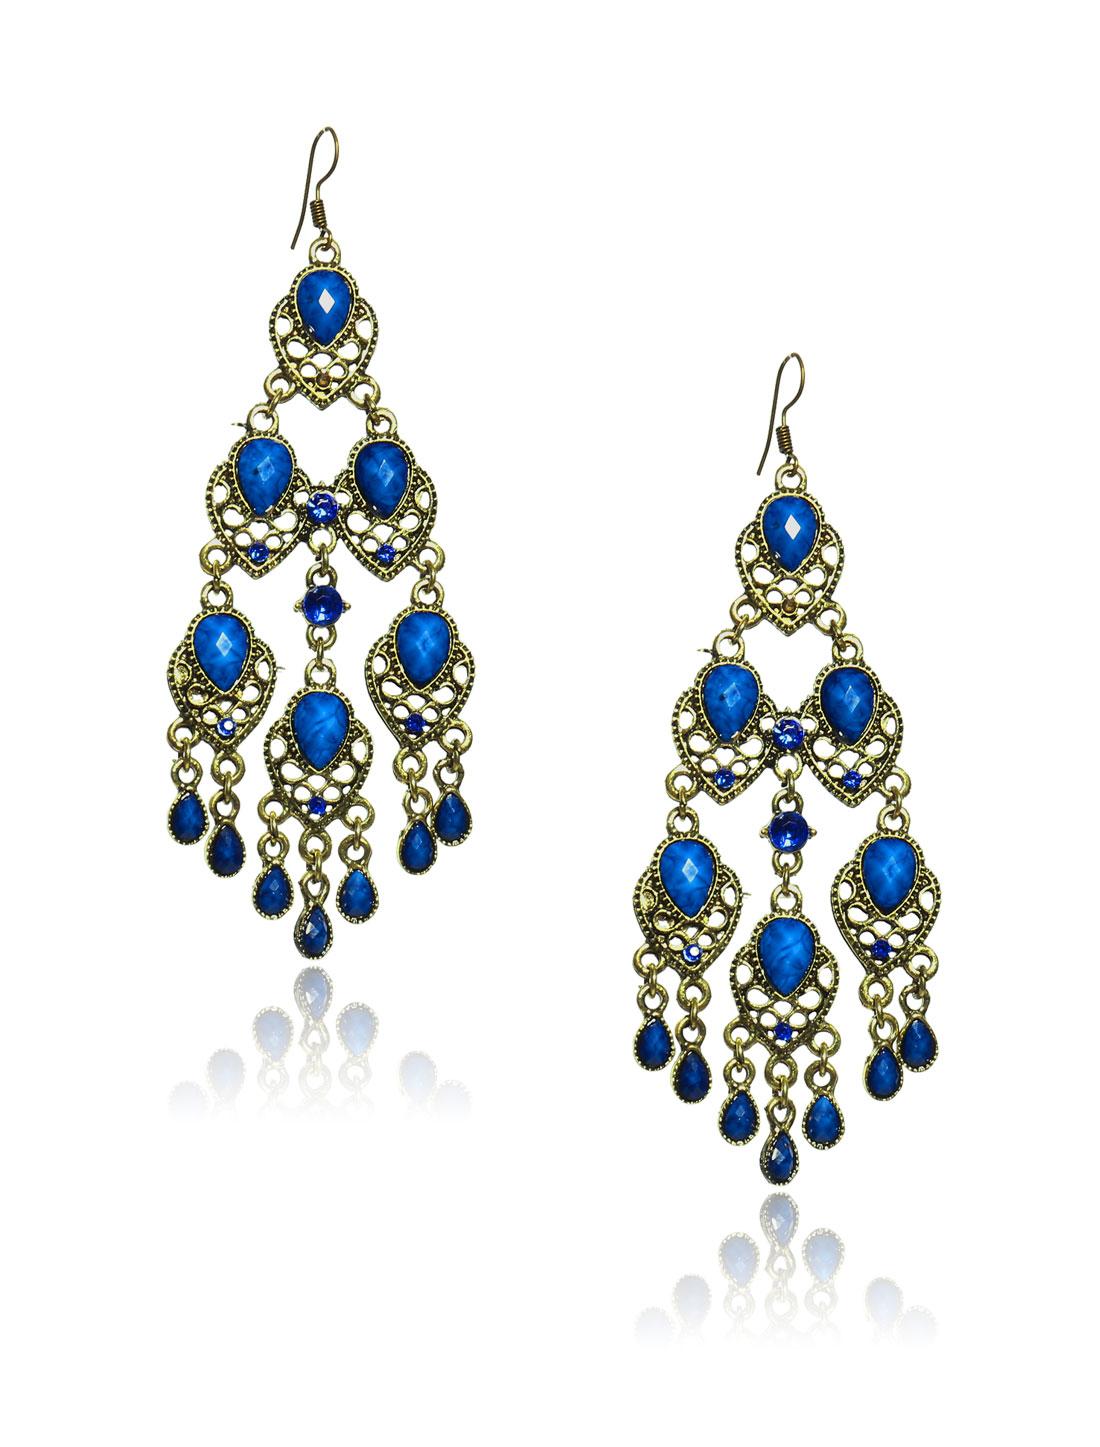 Women Retro Blue three-layer Shaped Crystal Resin Drop Dangle Hook Earring Ear Stud